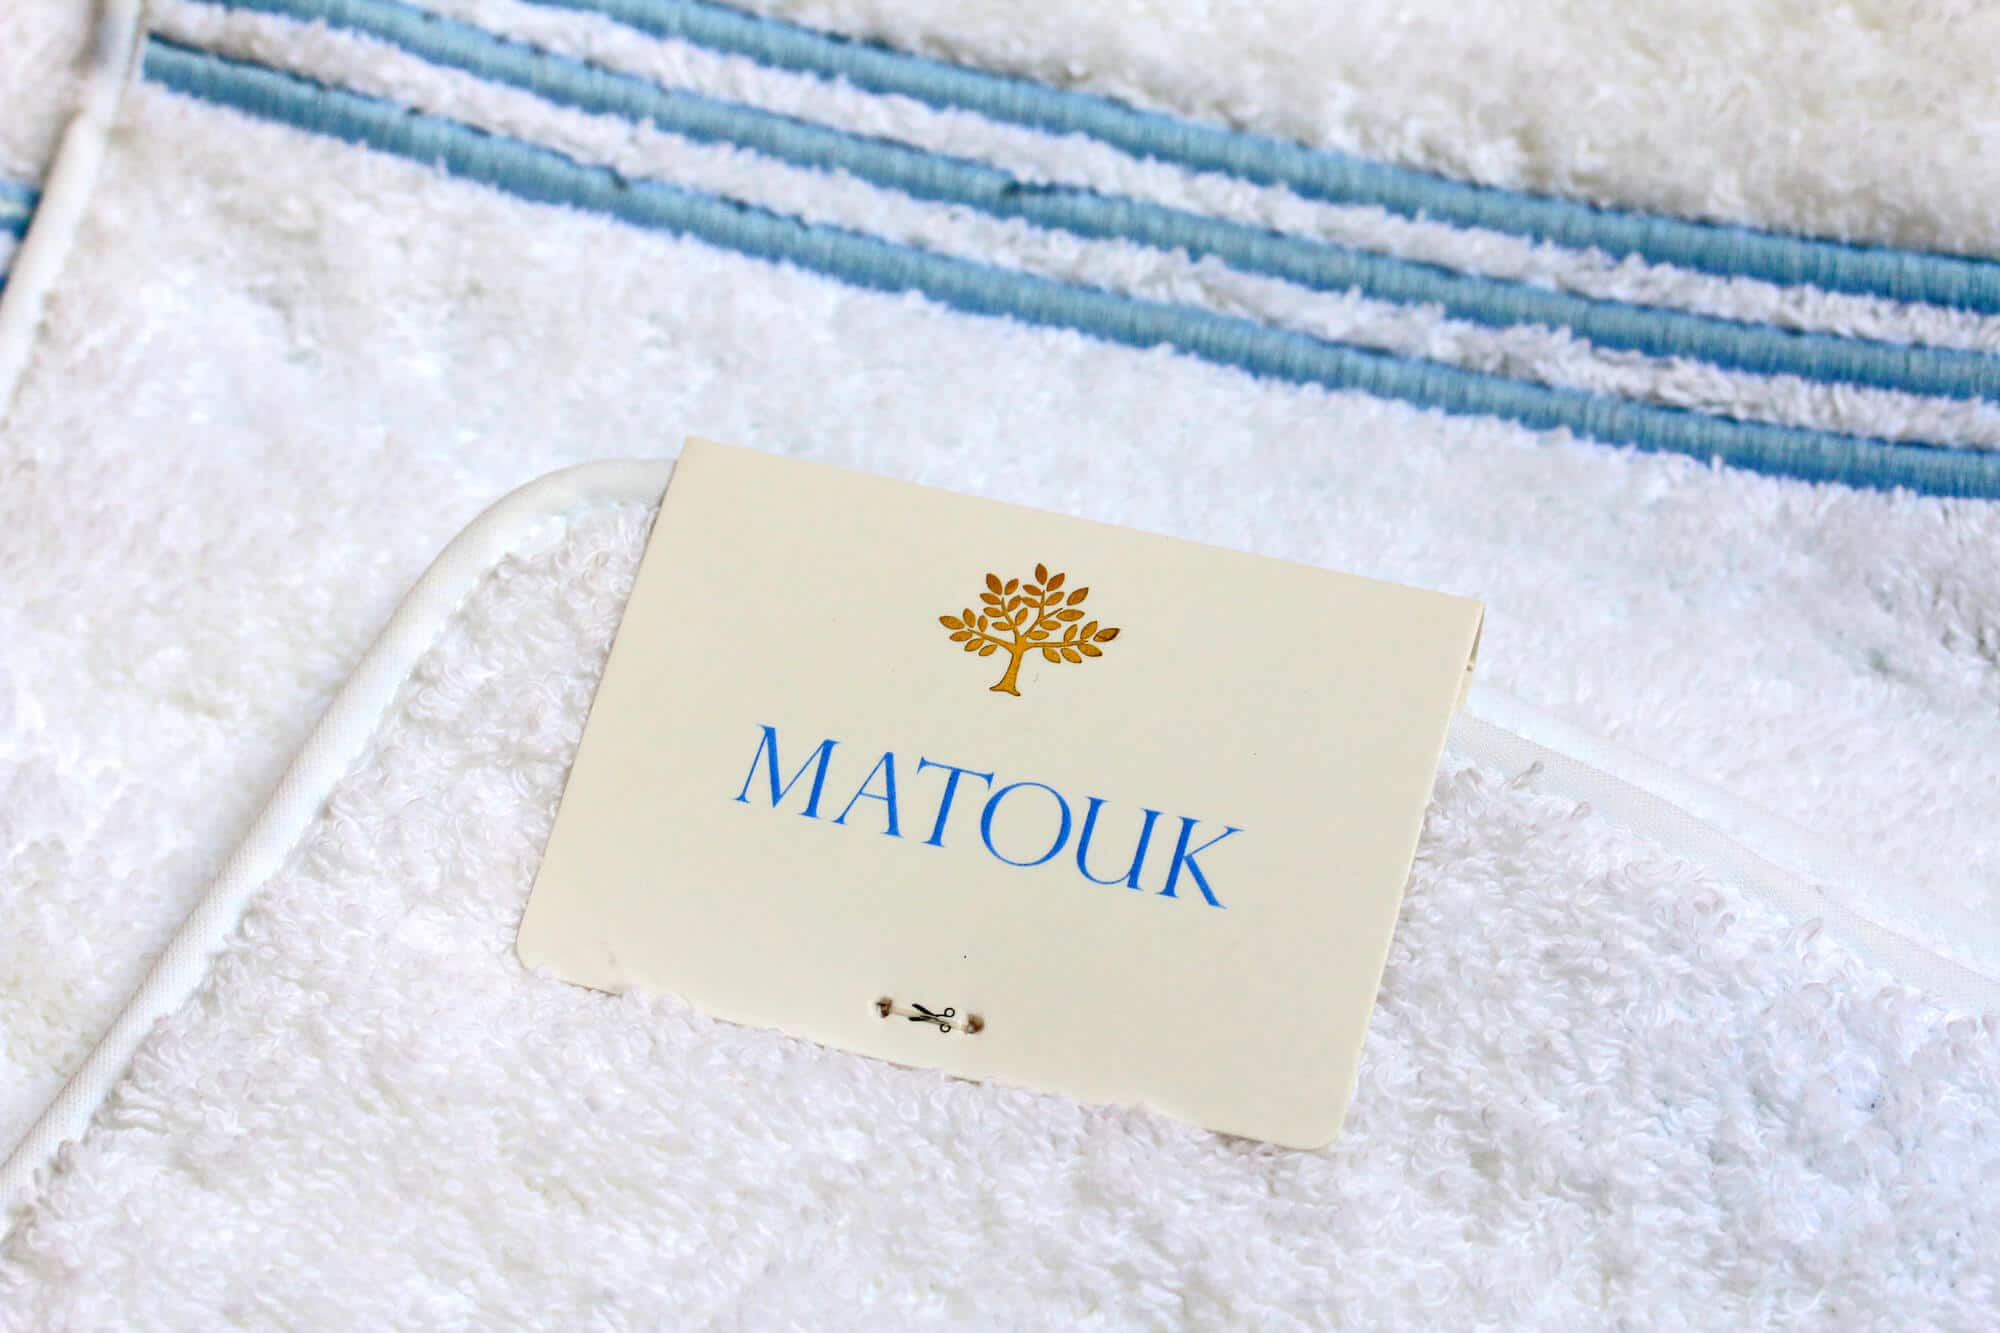 Matouk-6